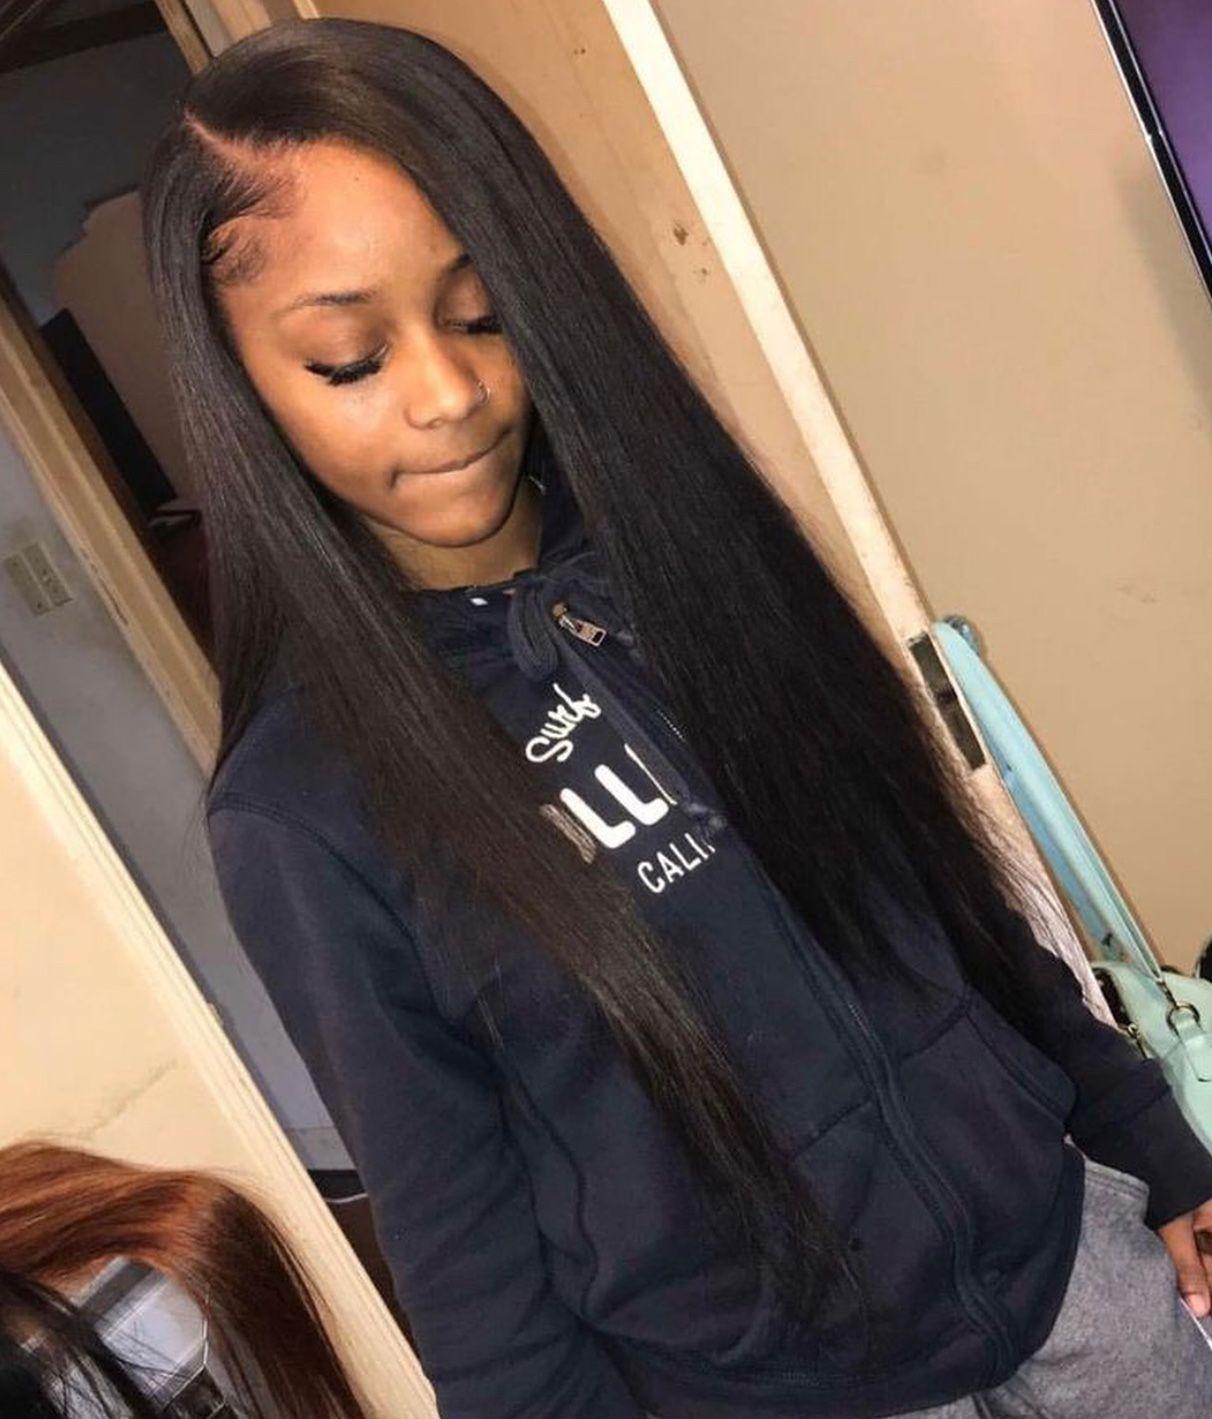 Brazilian Straight Www Tressencevirginhair Com Brazilian Straight Hair Human Hair Wigs Human Lace Front Wigs